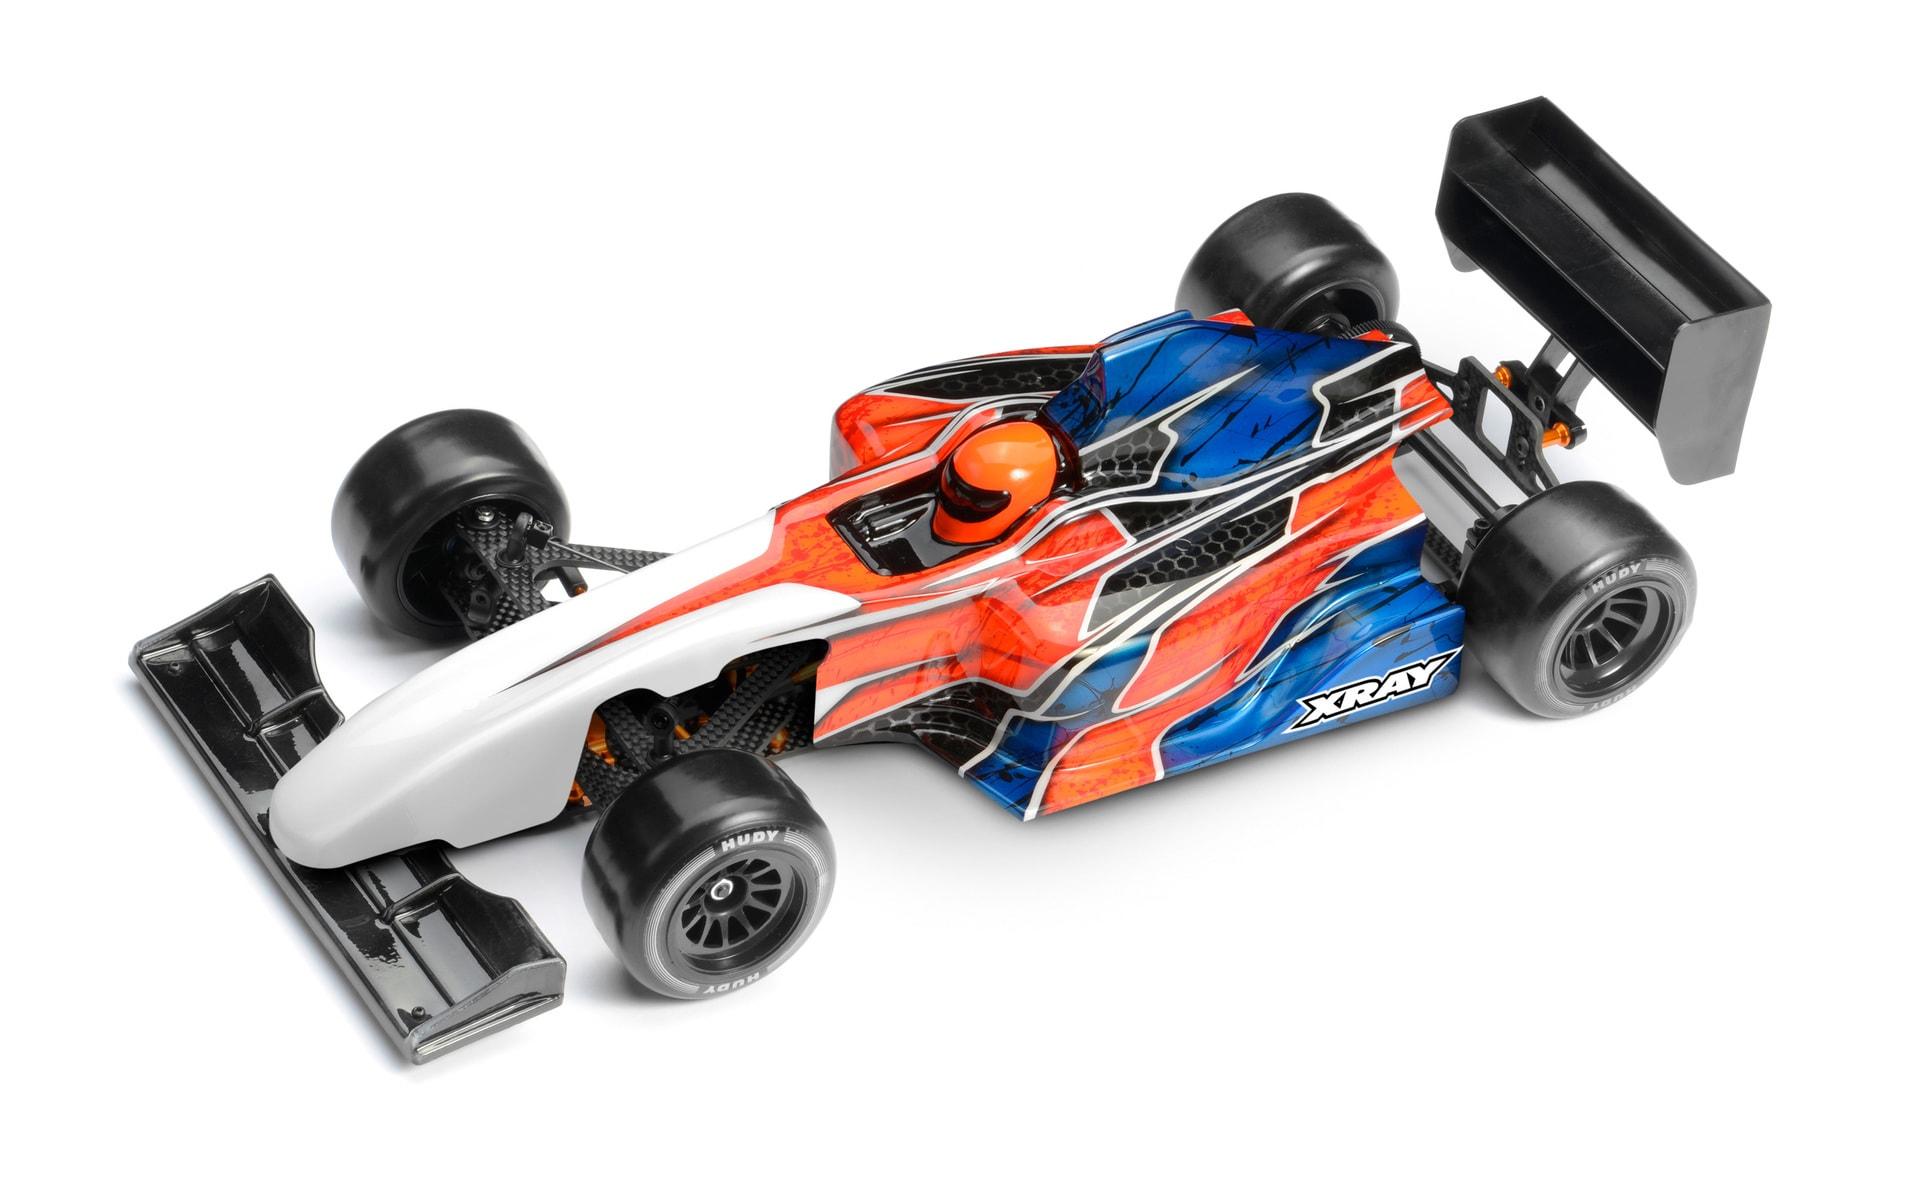 XRay X1'20 R/C Formula Racer Car Kit